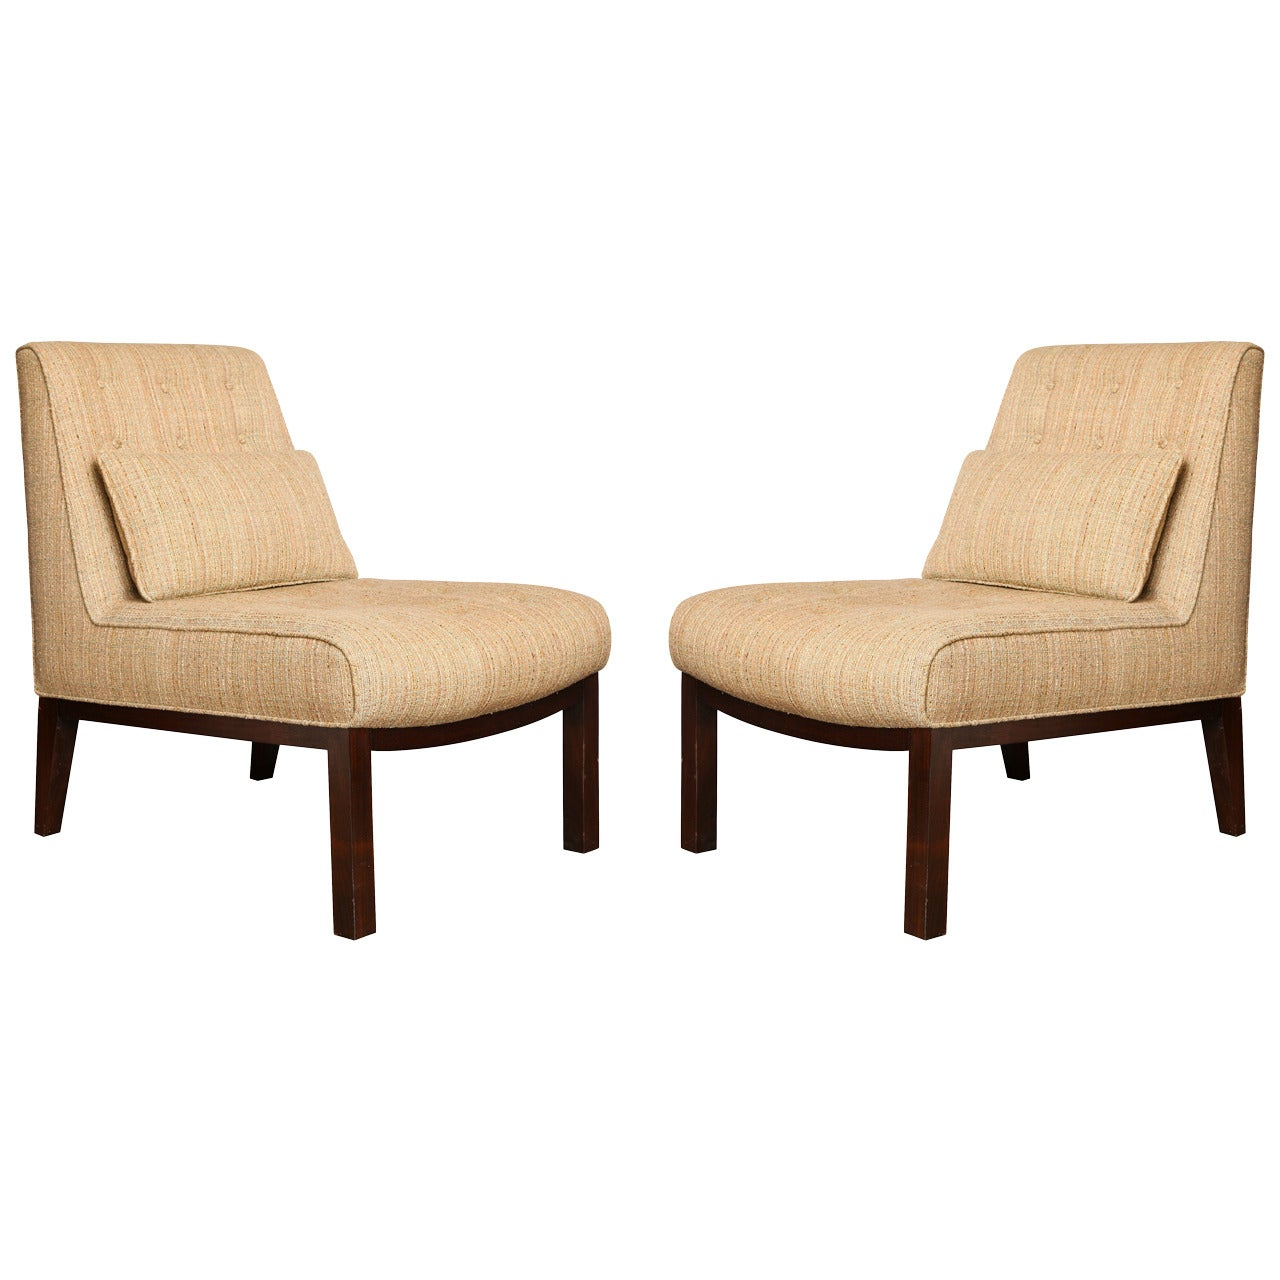 A Pair of Mid-Century Modern Edward Wormley for Dunbar Slipper Chairs